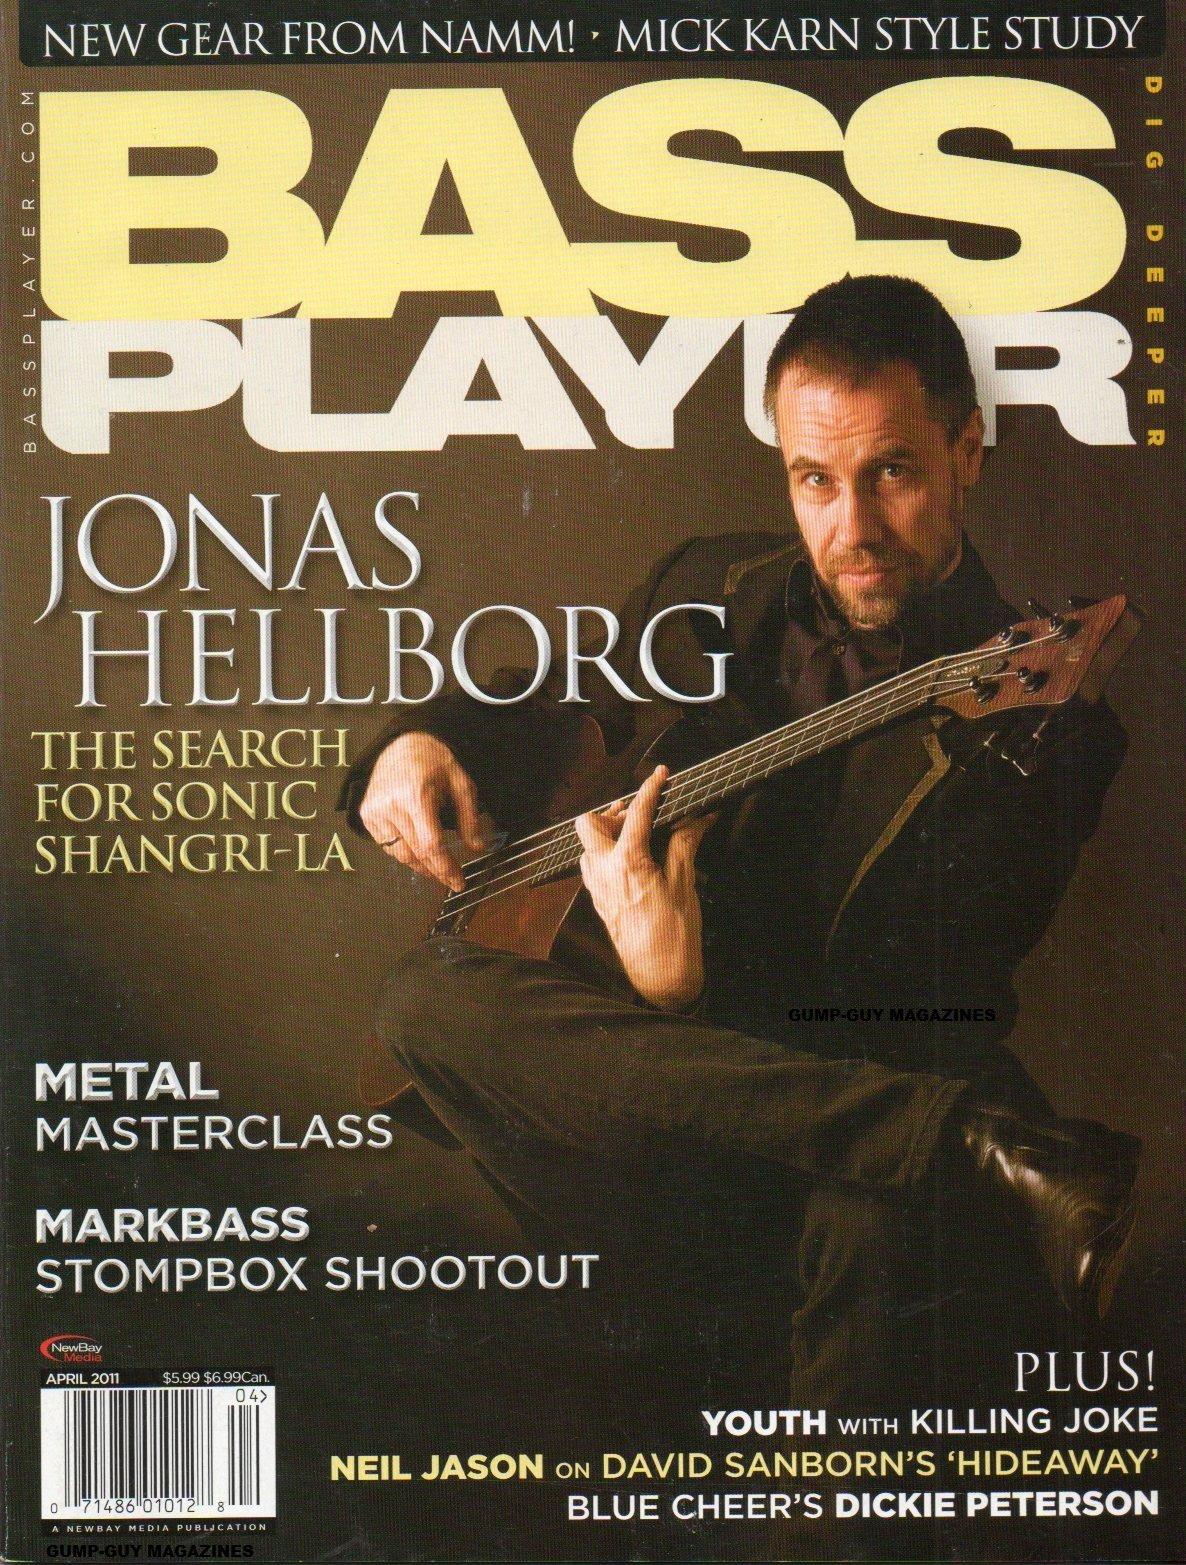 Download Bass Player April 2011 Magazine JONAS HELLBORG: THE SEARCH FOR SONIC SHANGRI-LA New Gear From Namm MICK KARN STYLE STUDY Metal Masterclass PDF